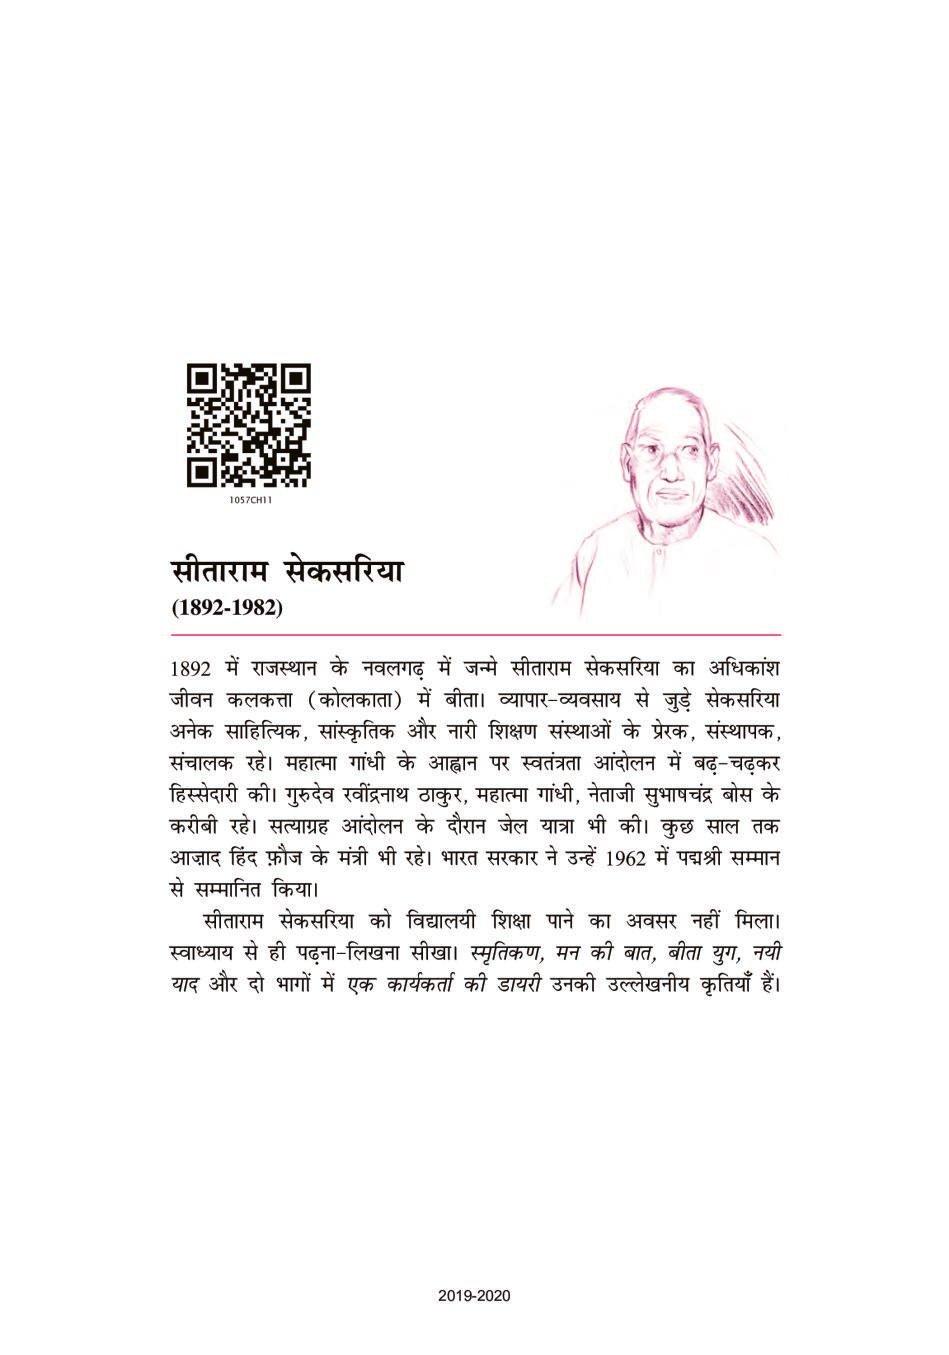 NCERT Book Class 10 Hindi (स्पर्श) Chapter 11 डायरी का एक पन्ना - Page 1